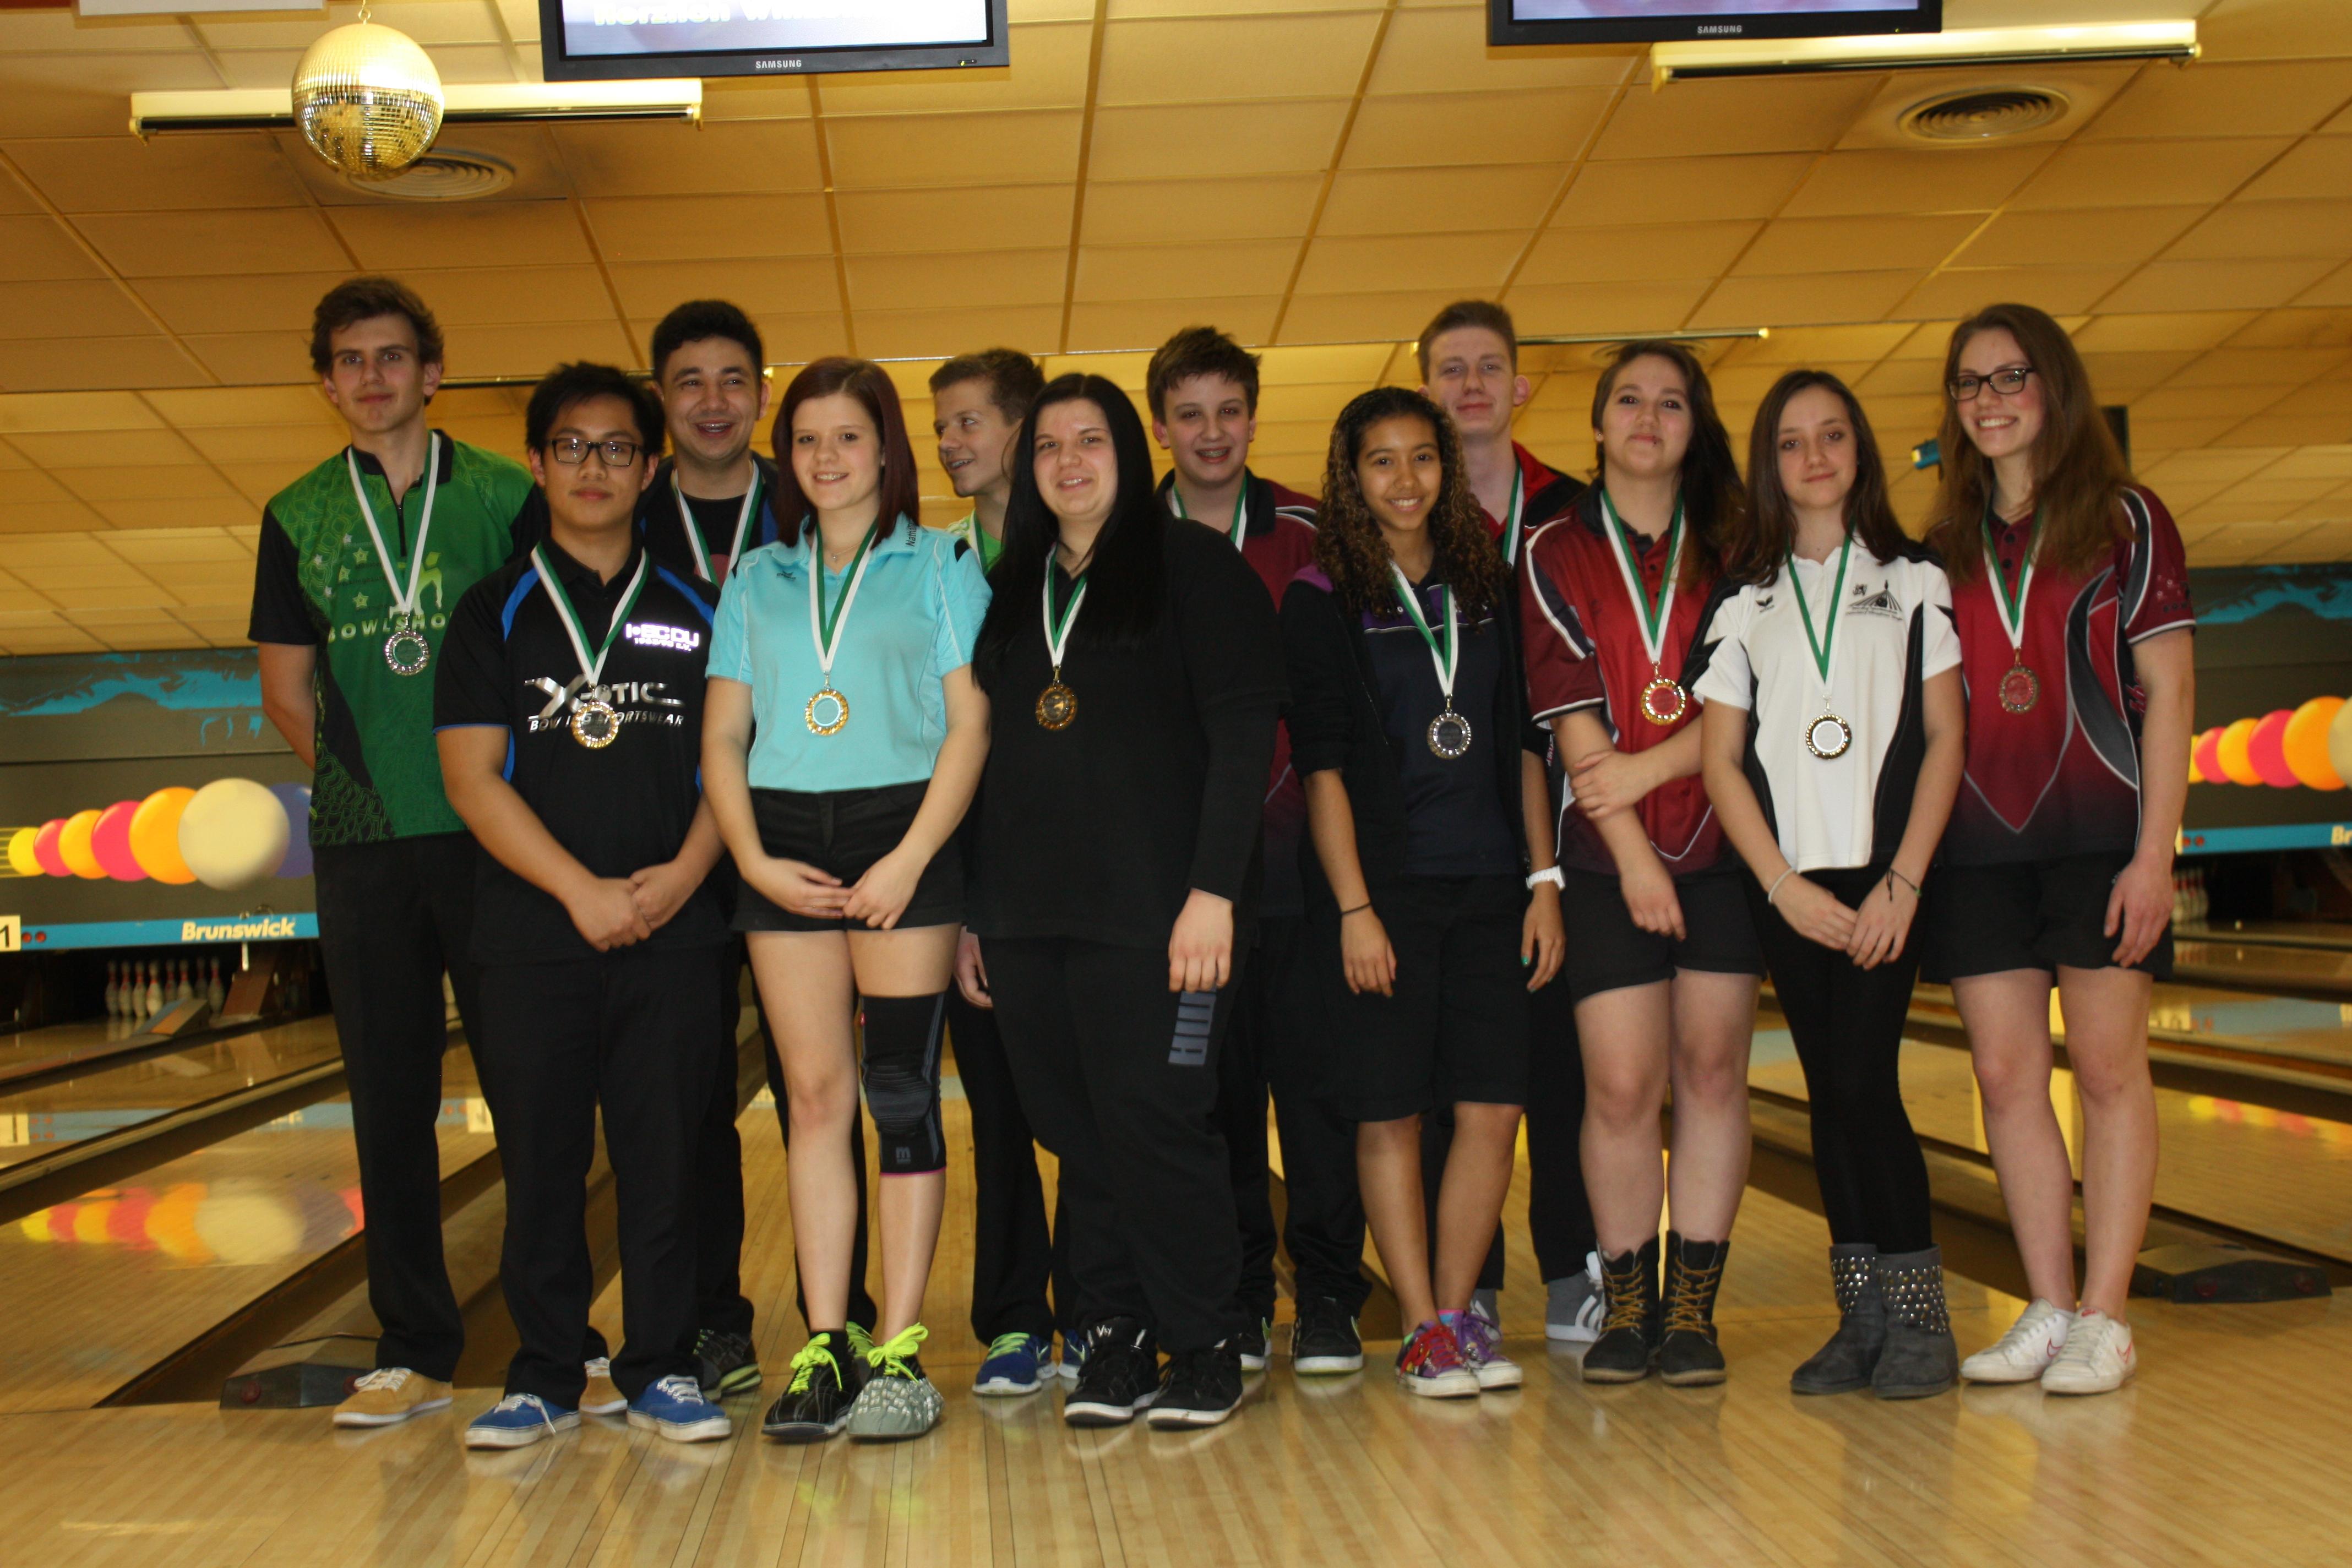 Landesmeisterschaften 2014 Jugend A + B – Endergebnisse